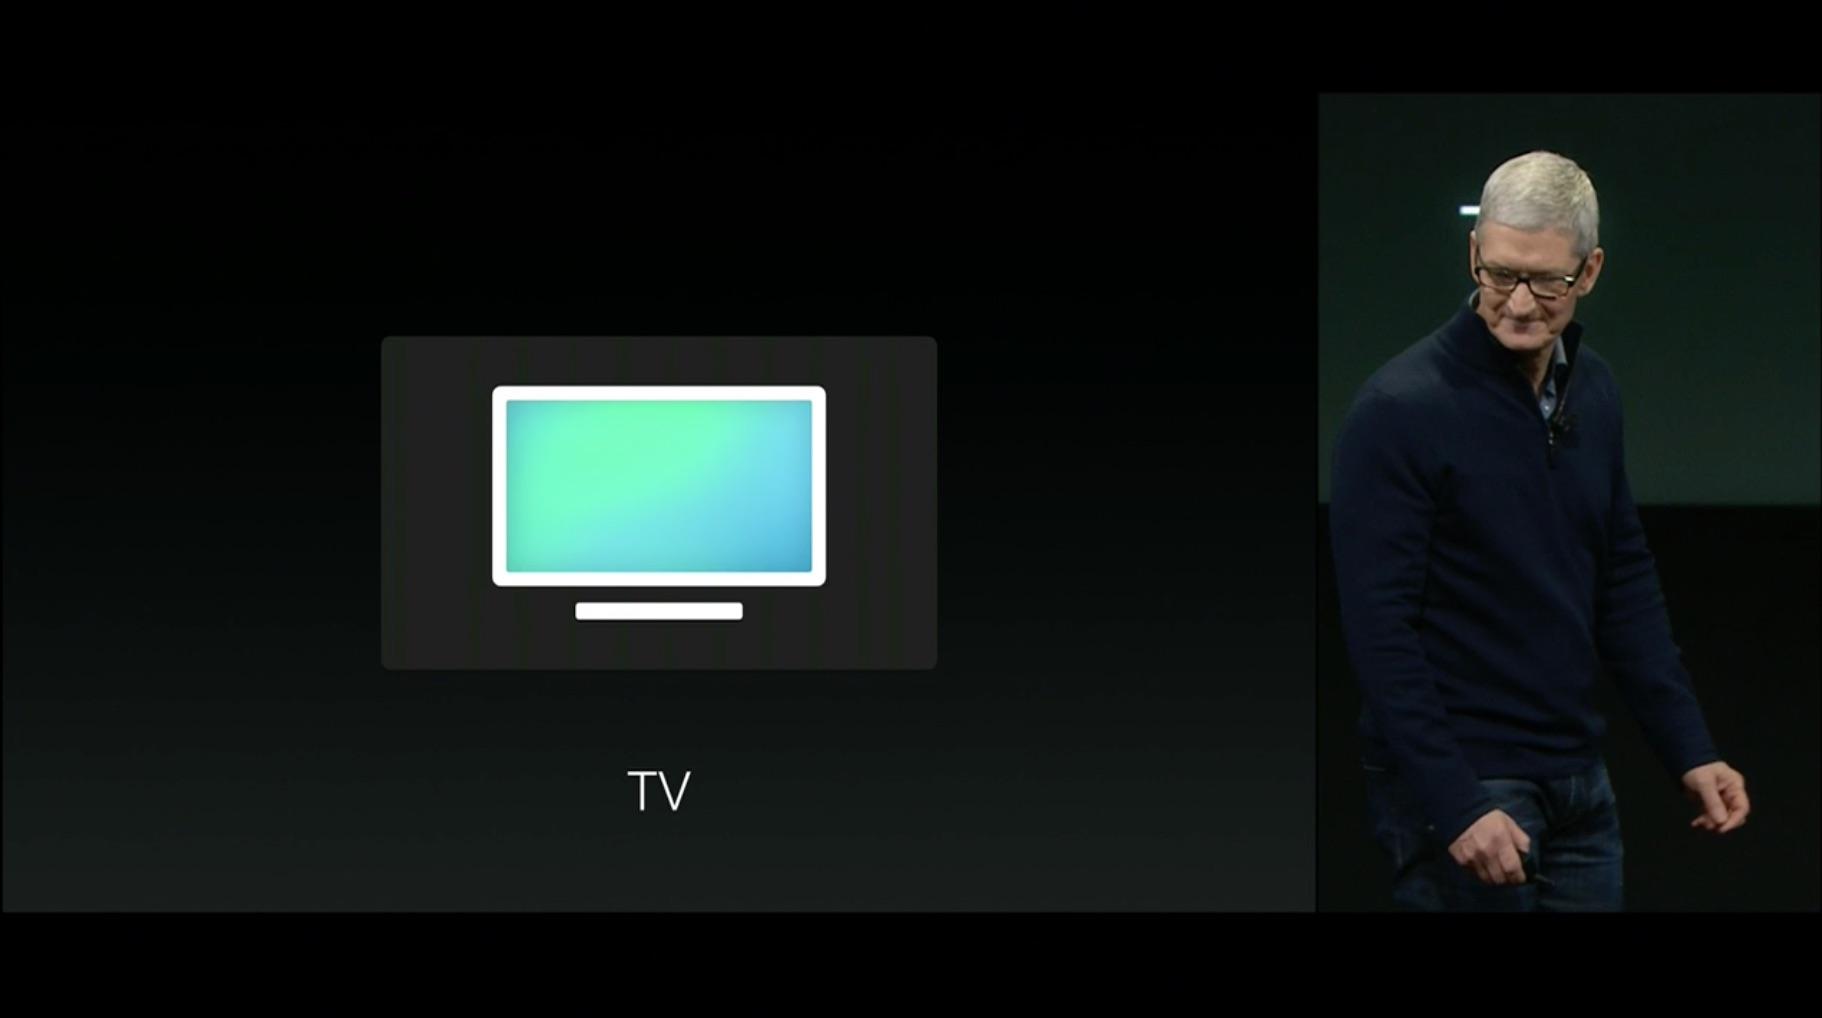 apple debuts u201ctv u201d a tv guide and watchlist app for apple tv iphone rh techcrunch com michelin guide ipad app ipad tv guide app